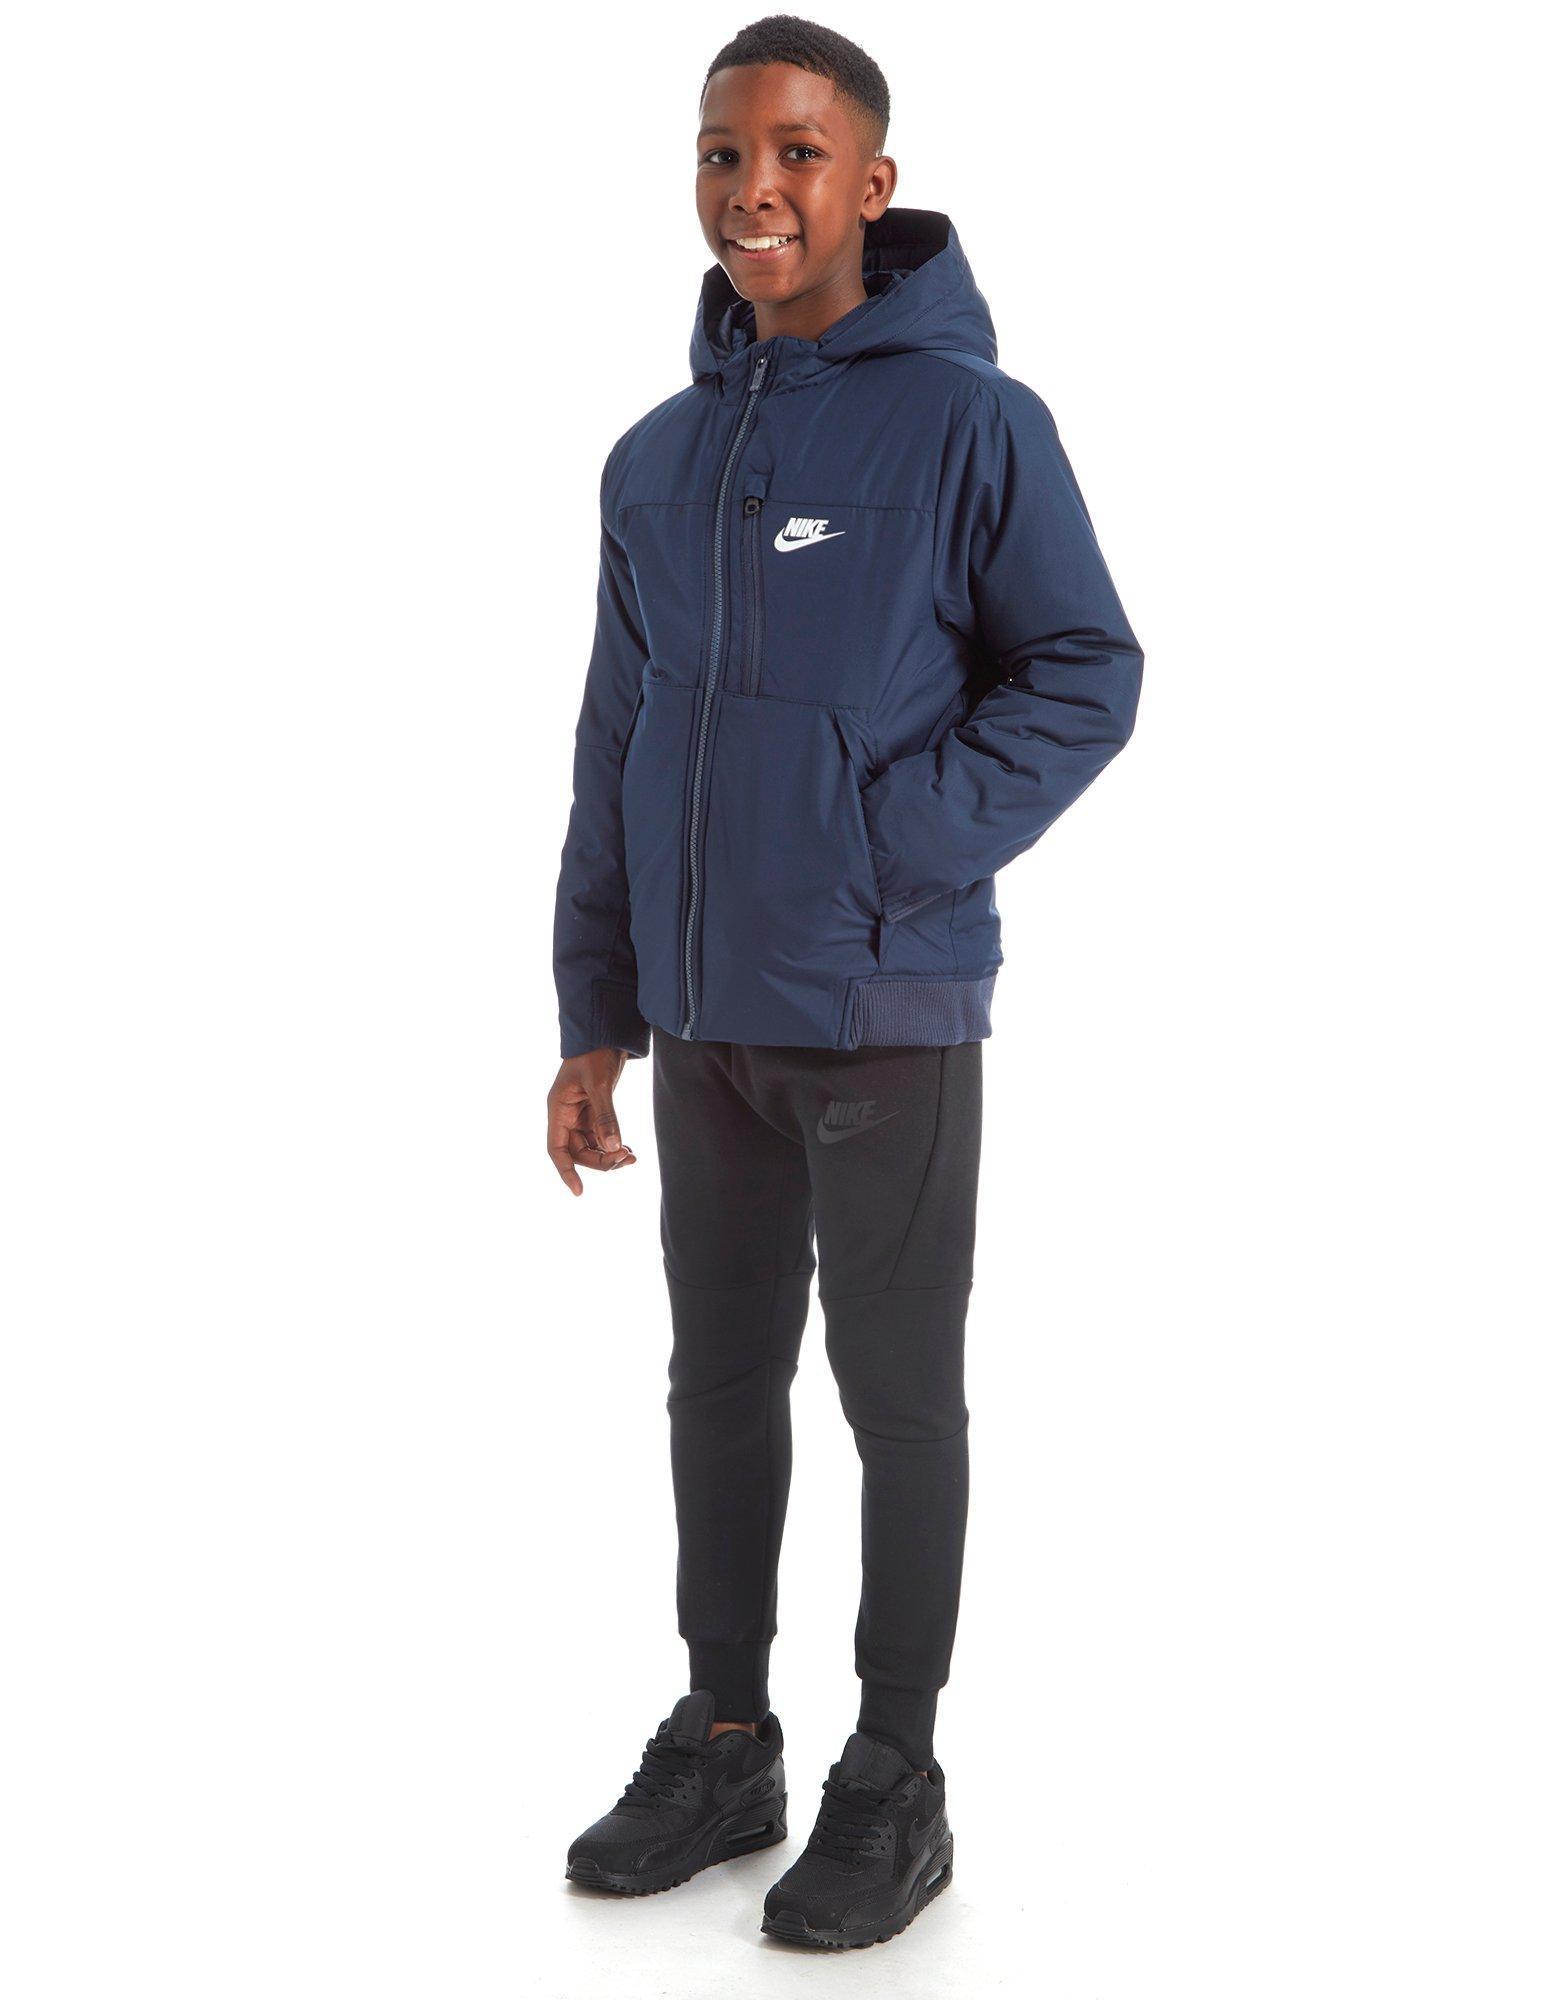 Lyst - Nike Core Padded Jacket Junior in Blue for Men